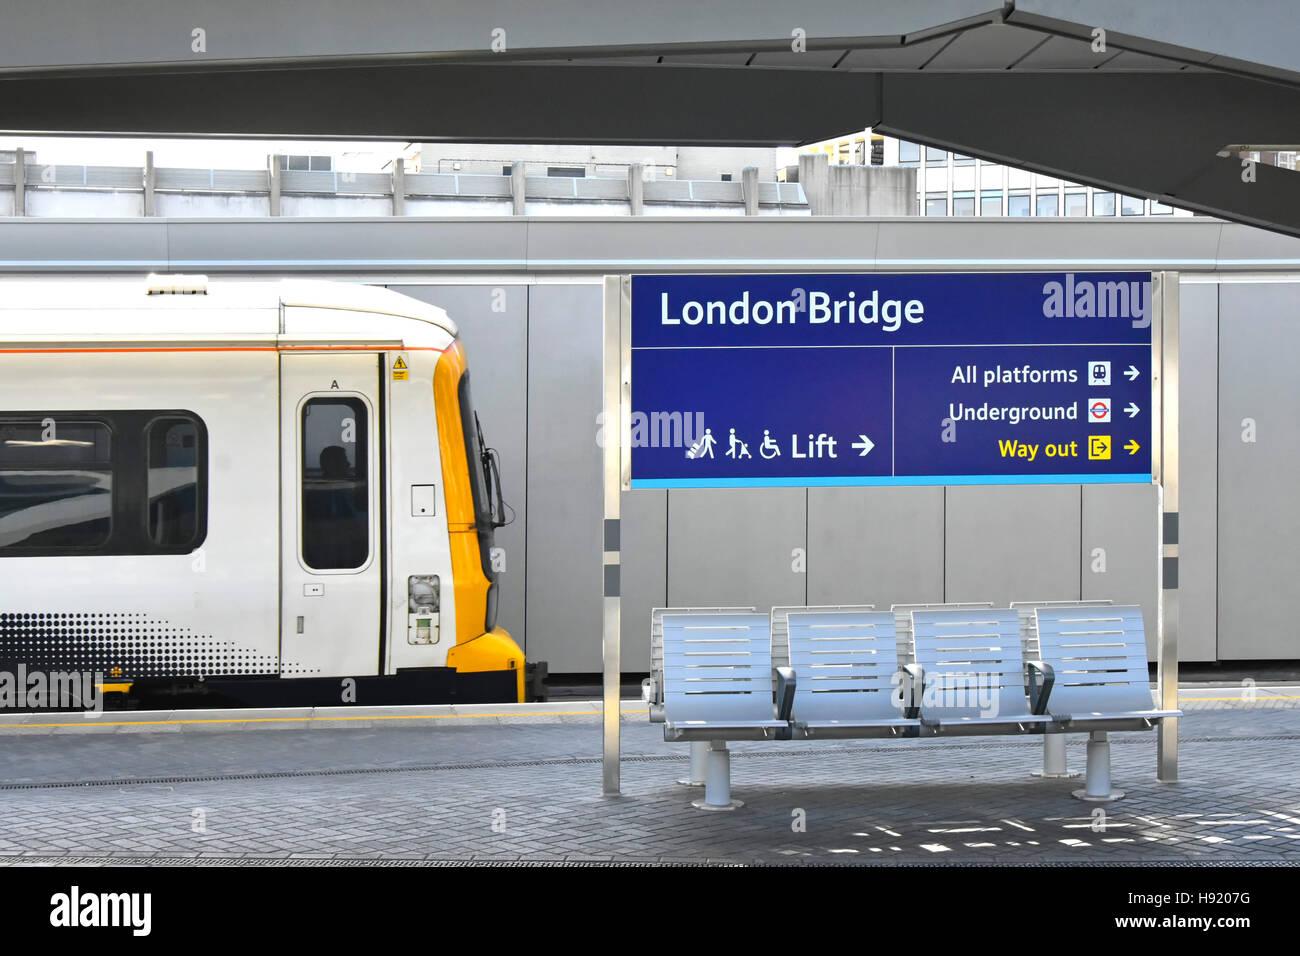 Train arriving at refurbished platform facilities at London Bridge Railway Station part of a major public transport - Stock Image